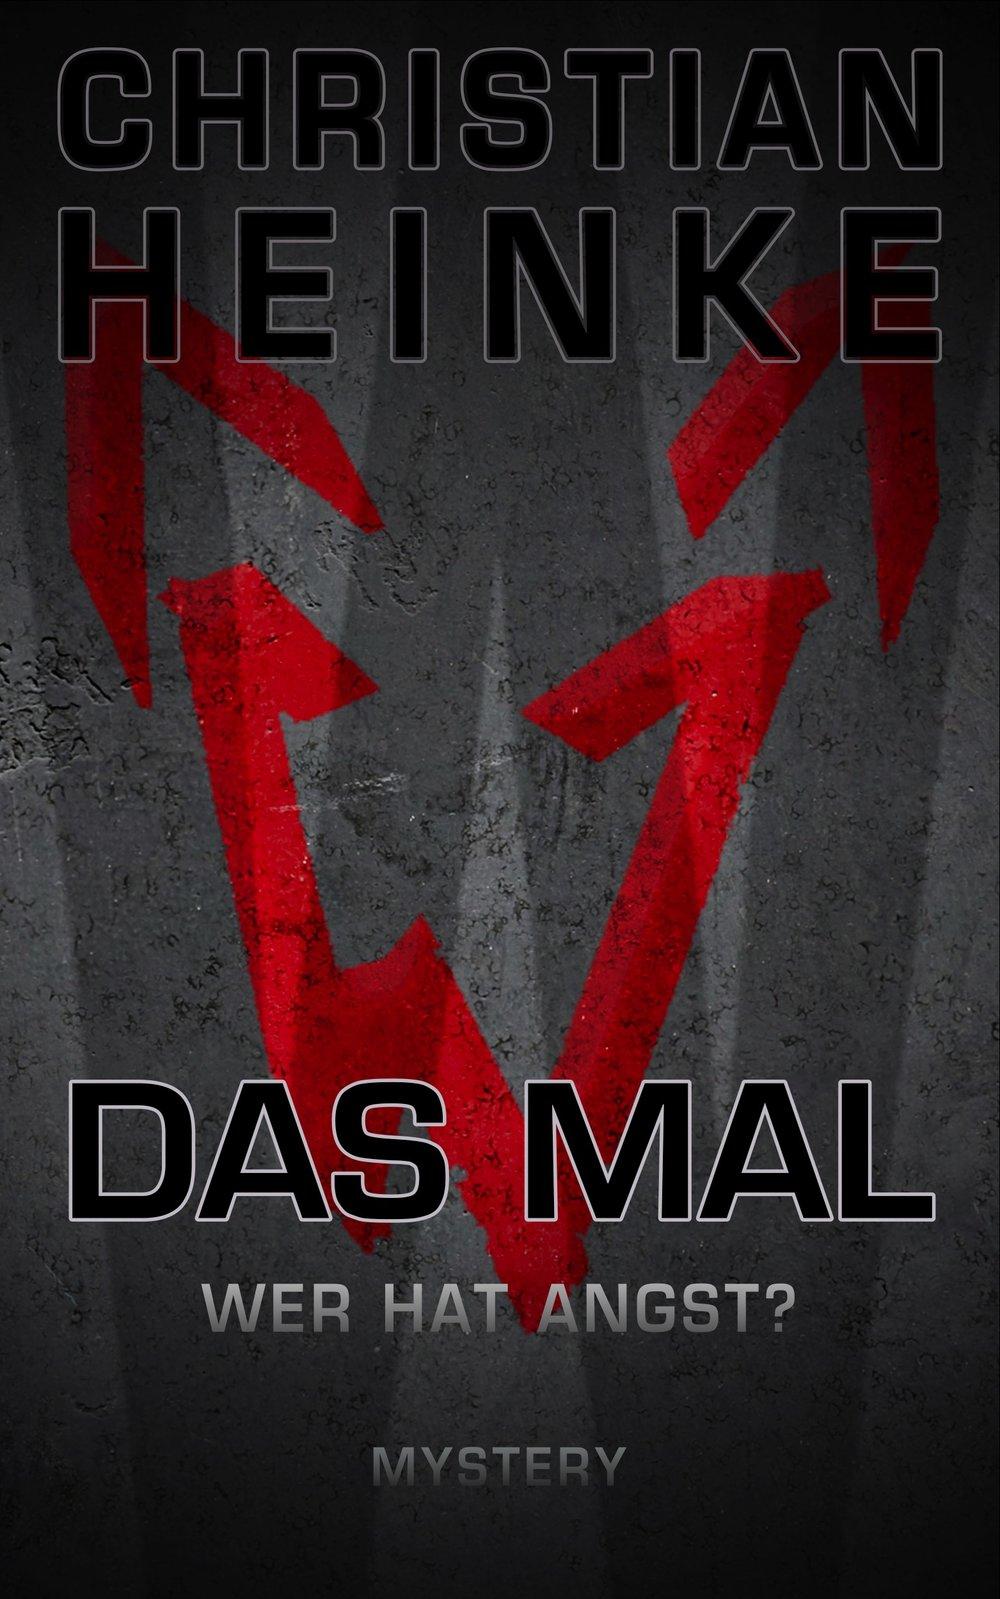 Christian Heinke - Das Mal — heinkedigital.com